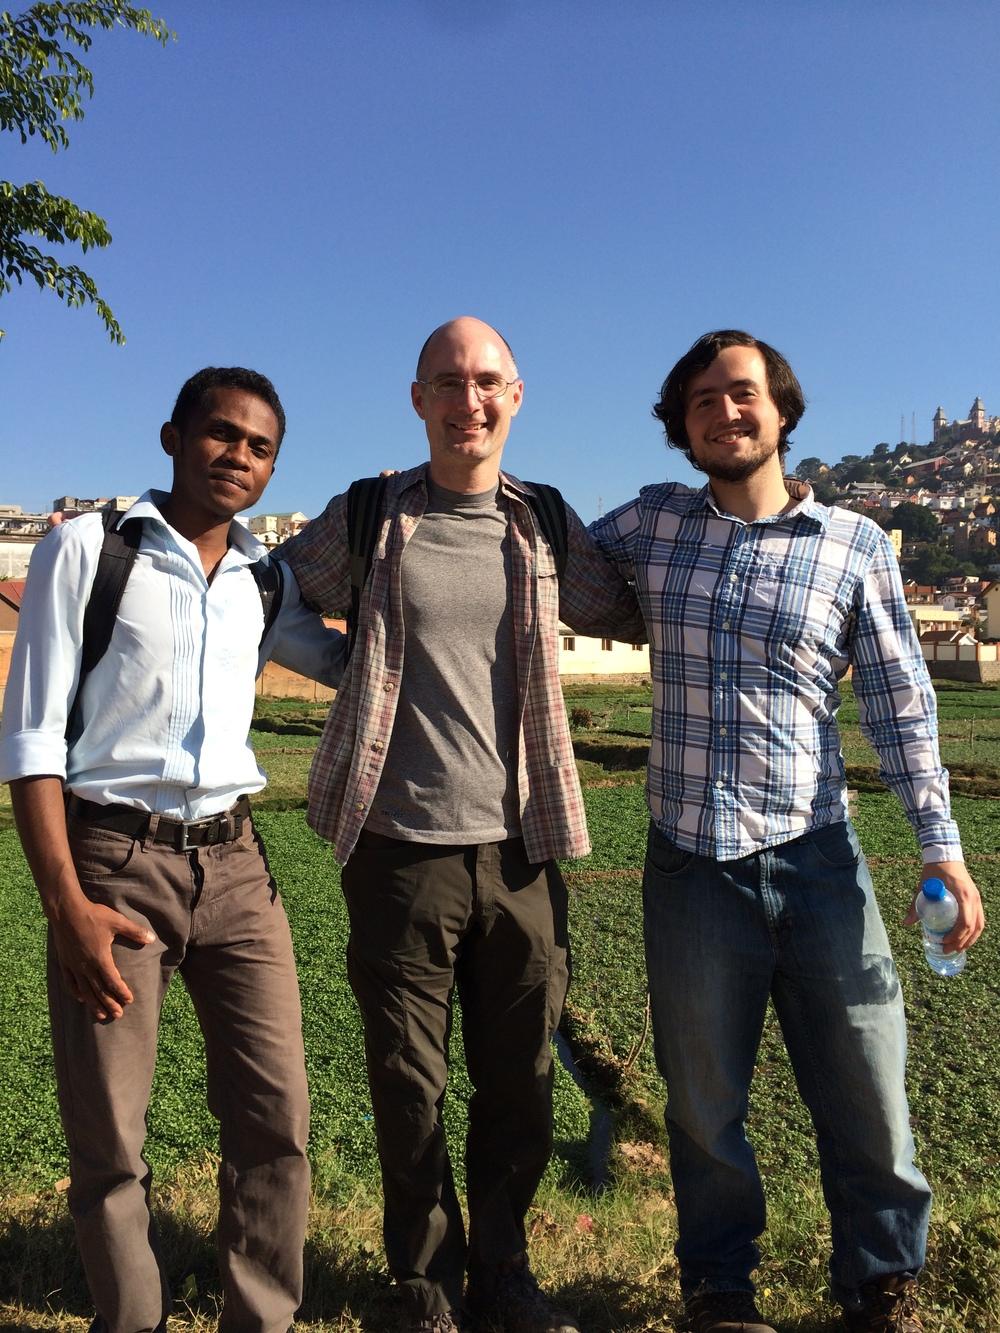 Graduate student Heritiana Randrianatoandro,Dr. Perry, and graduate student Richard Bankoff in Antananarivo, Madagascar